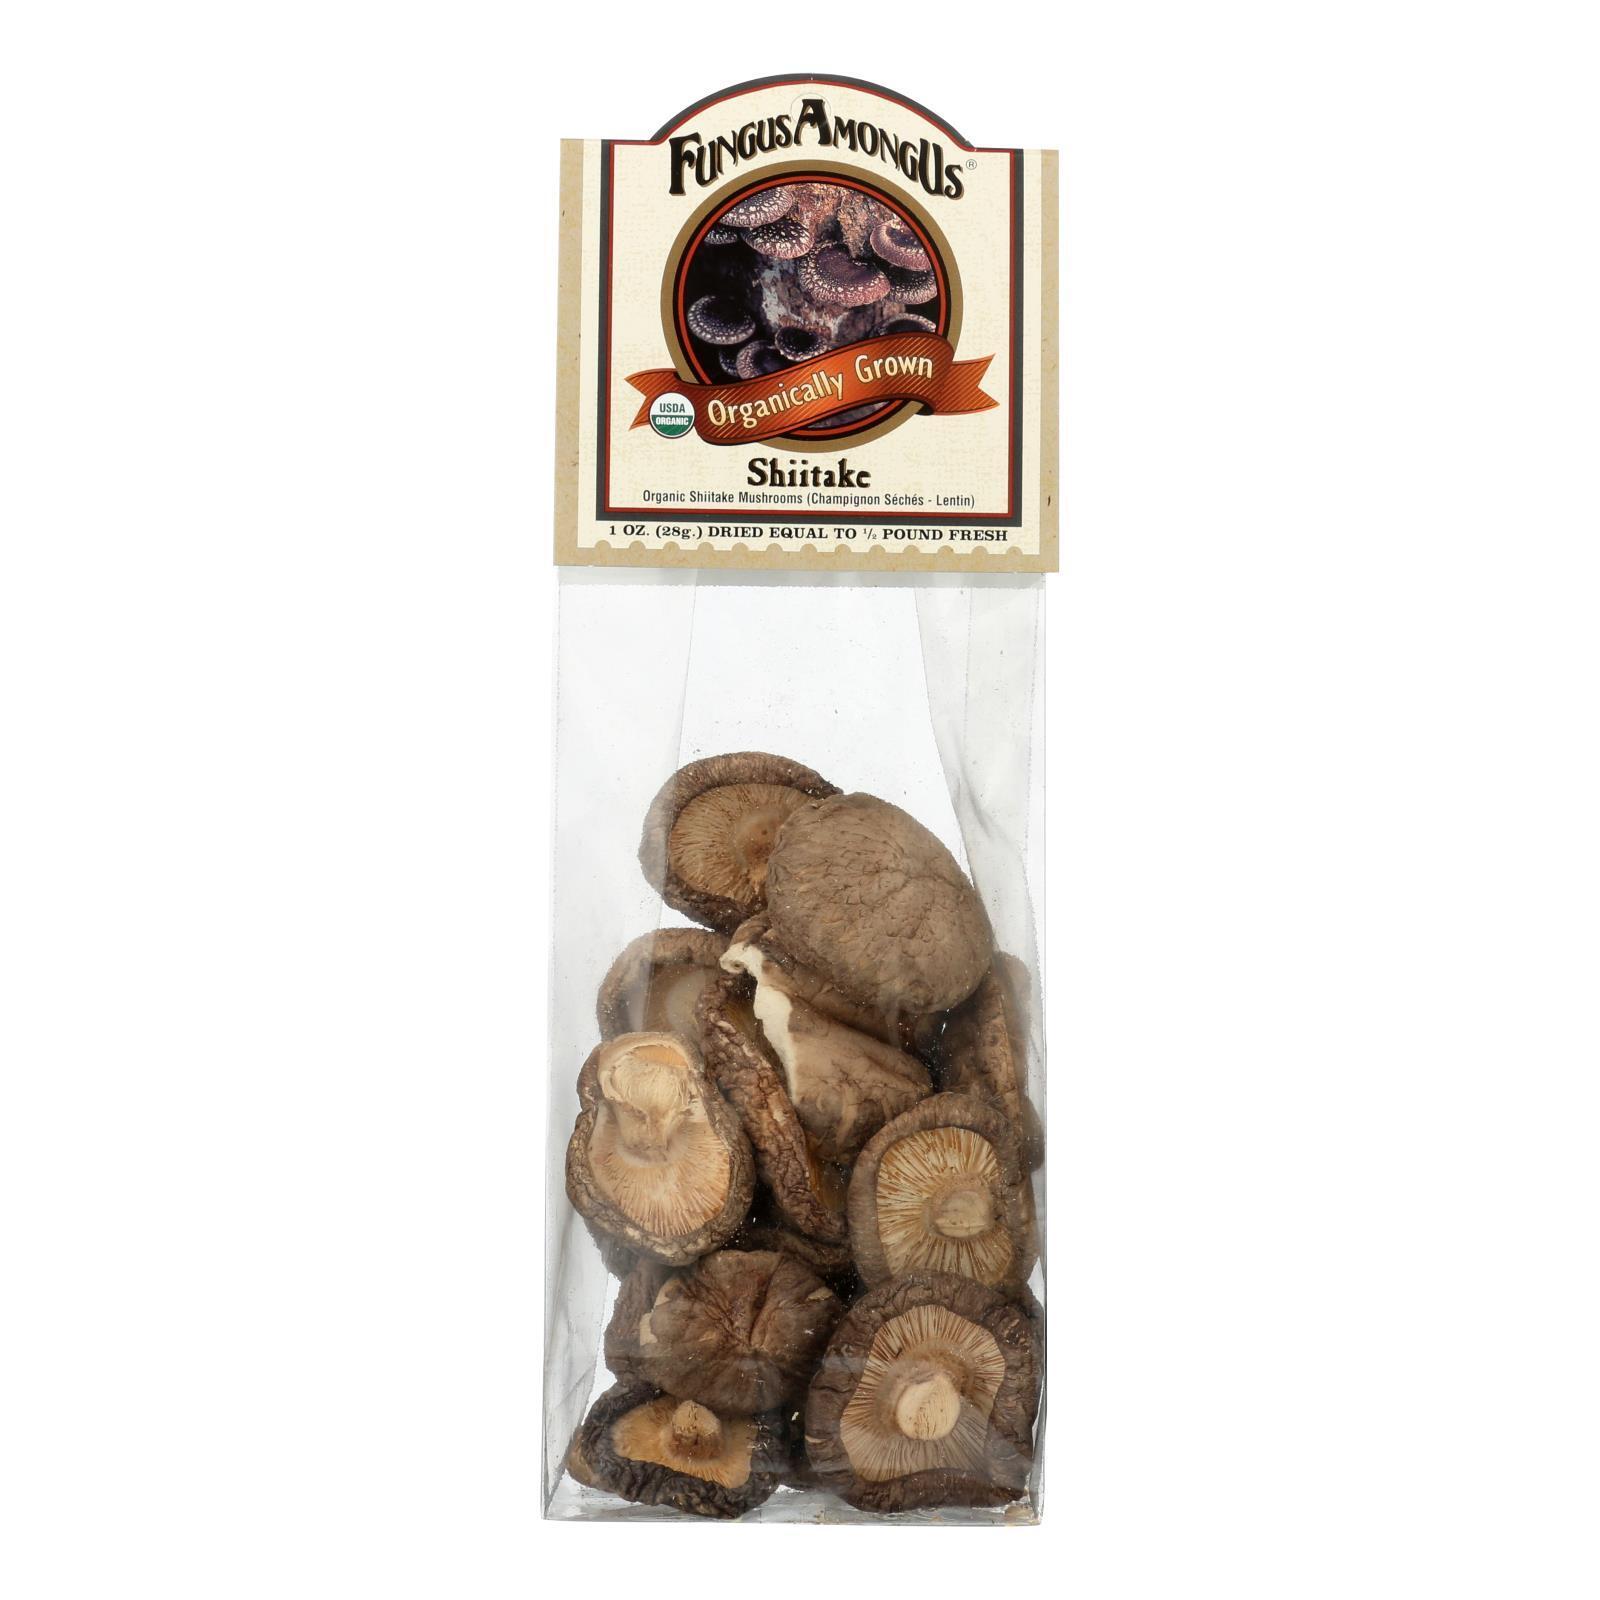 Fungus Among Us Mushrooms - Organic - Dried - Shiitake - 1 oz - case of 8